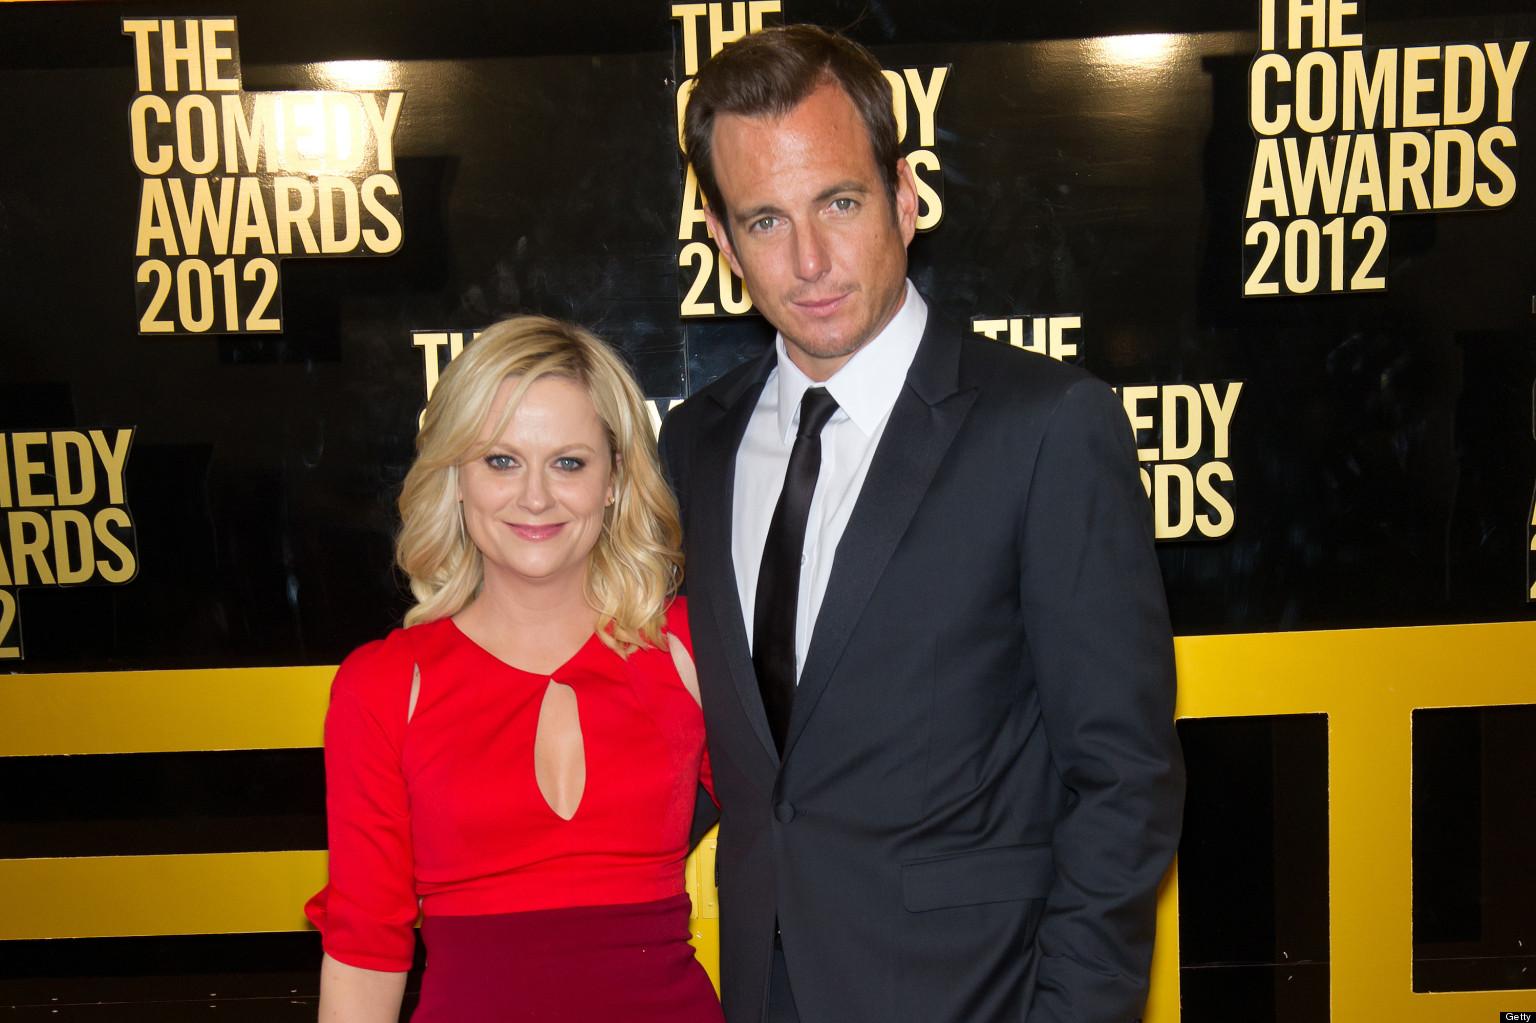 celebrity divorce - New York Daily News